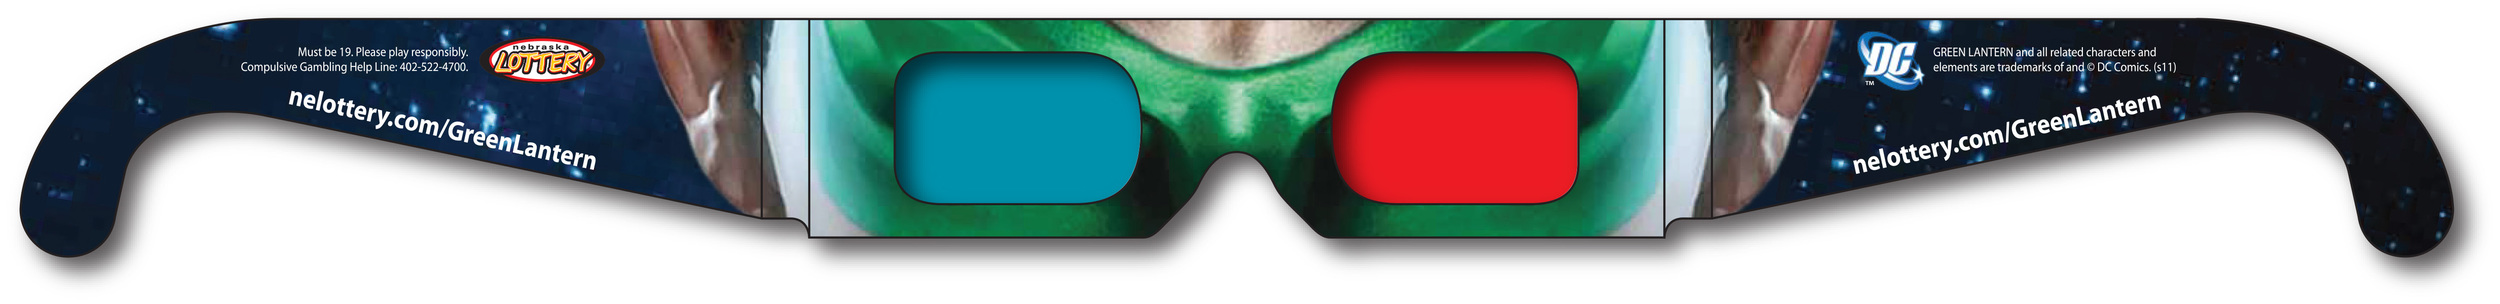 green_lantern_custom_anaglyph_glasses